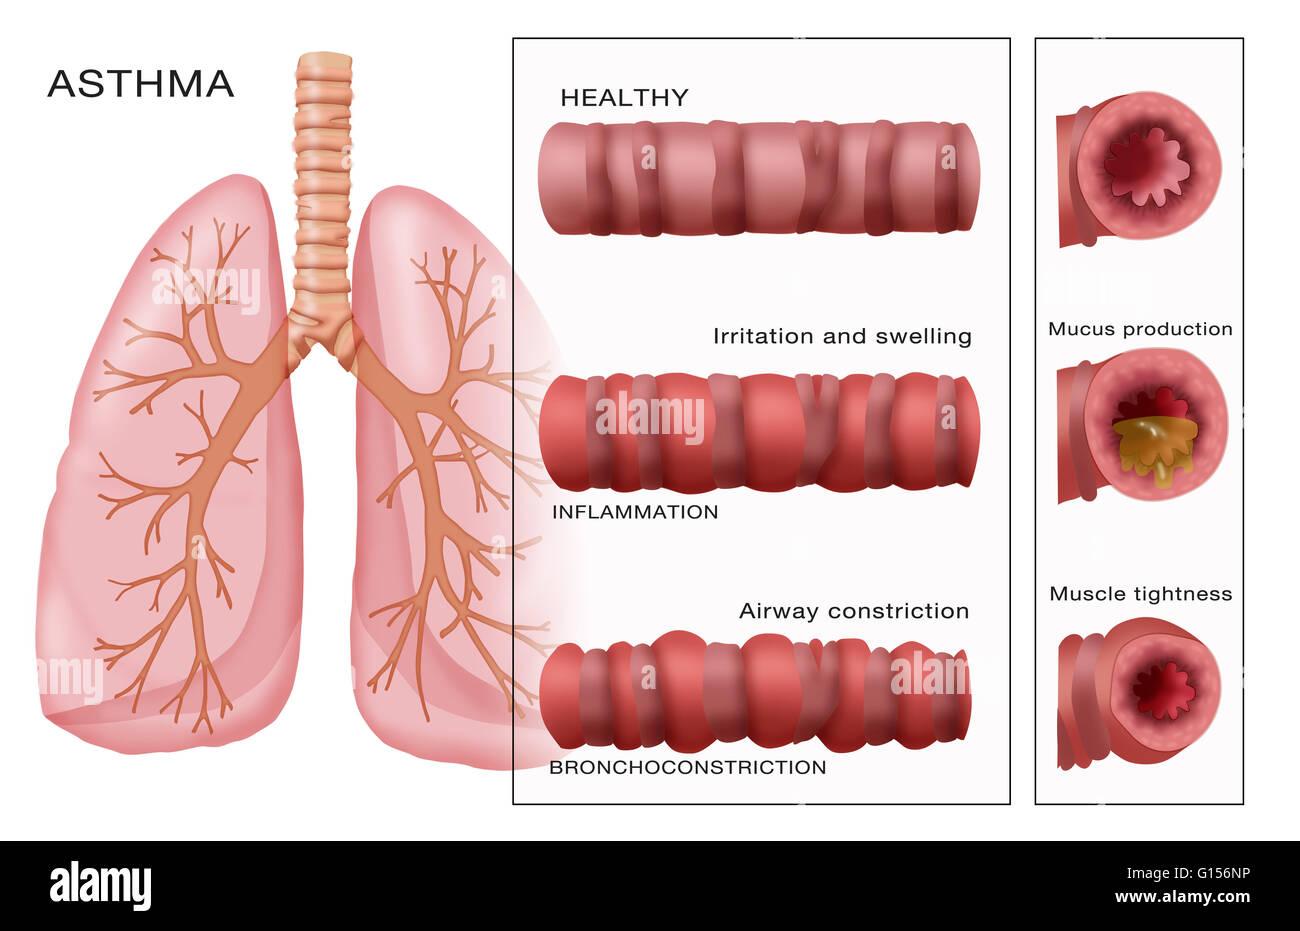 bronchiole asthma stock photos amp bronchiole asthma stock